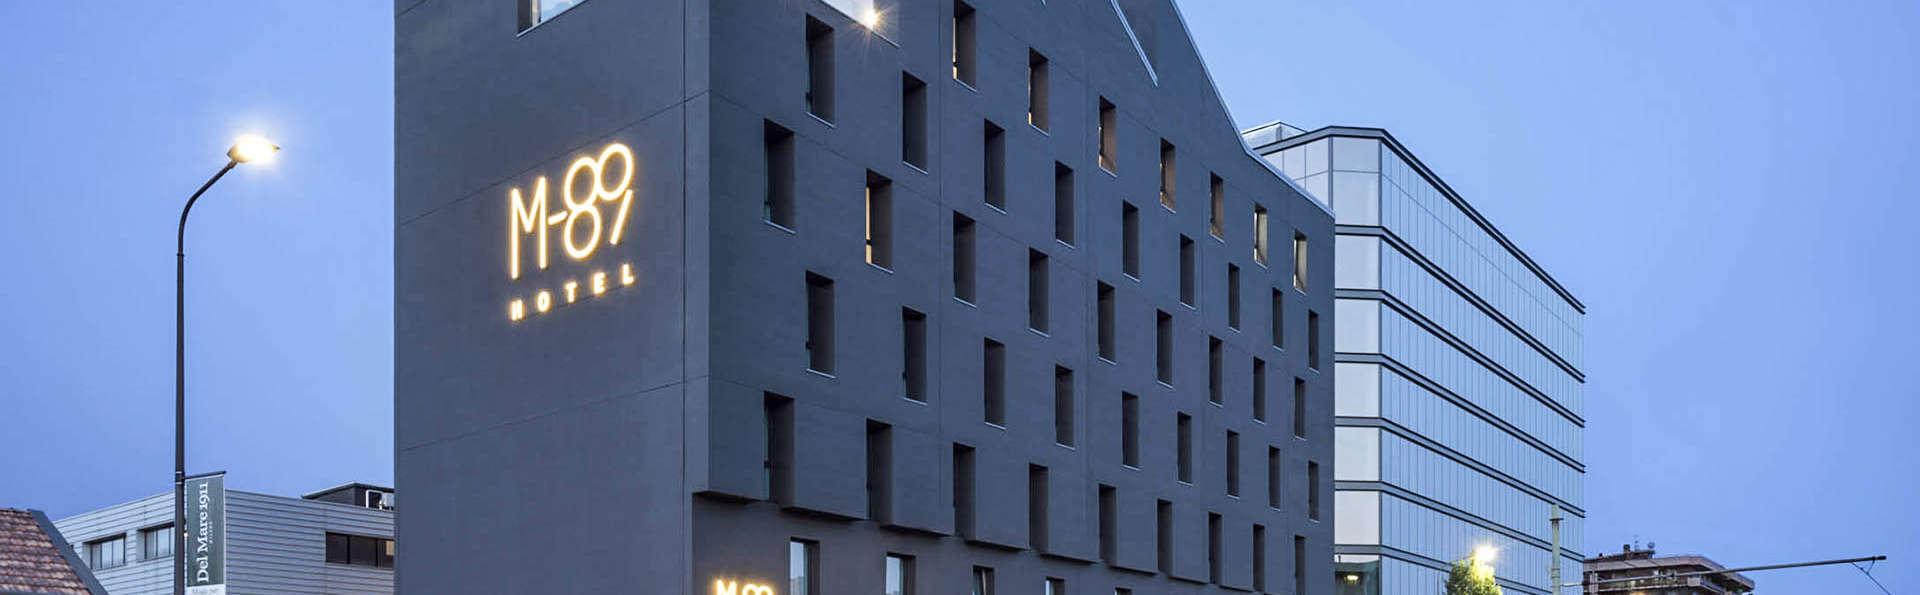 M89 Hotel - EDIT_Esterno_sera_01.jpg